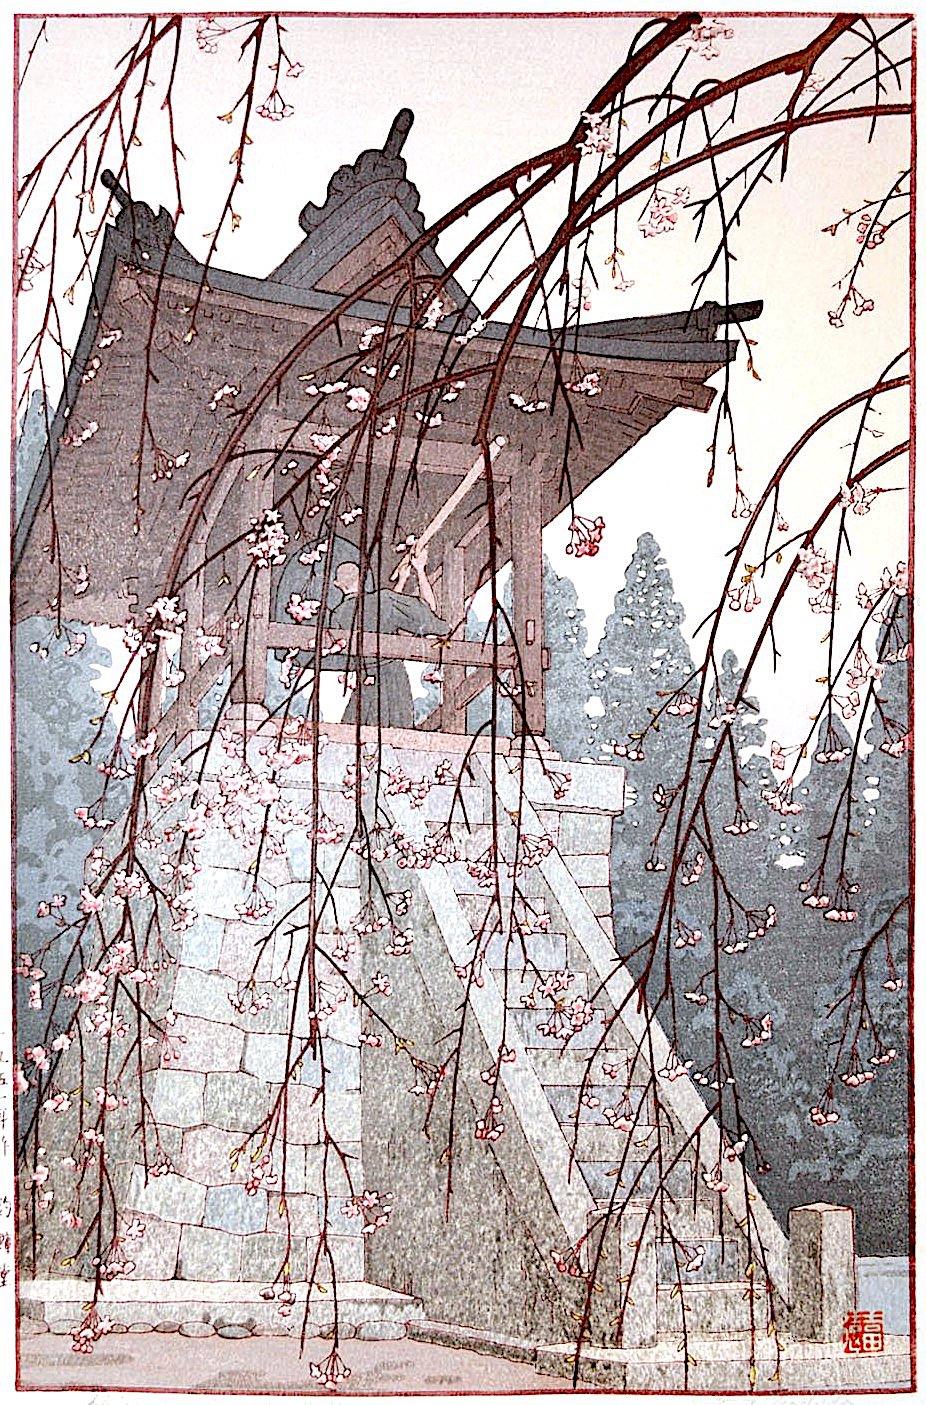 Toshi Yoshida, a monk strinking a bell among blossoms